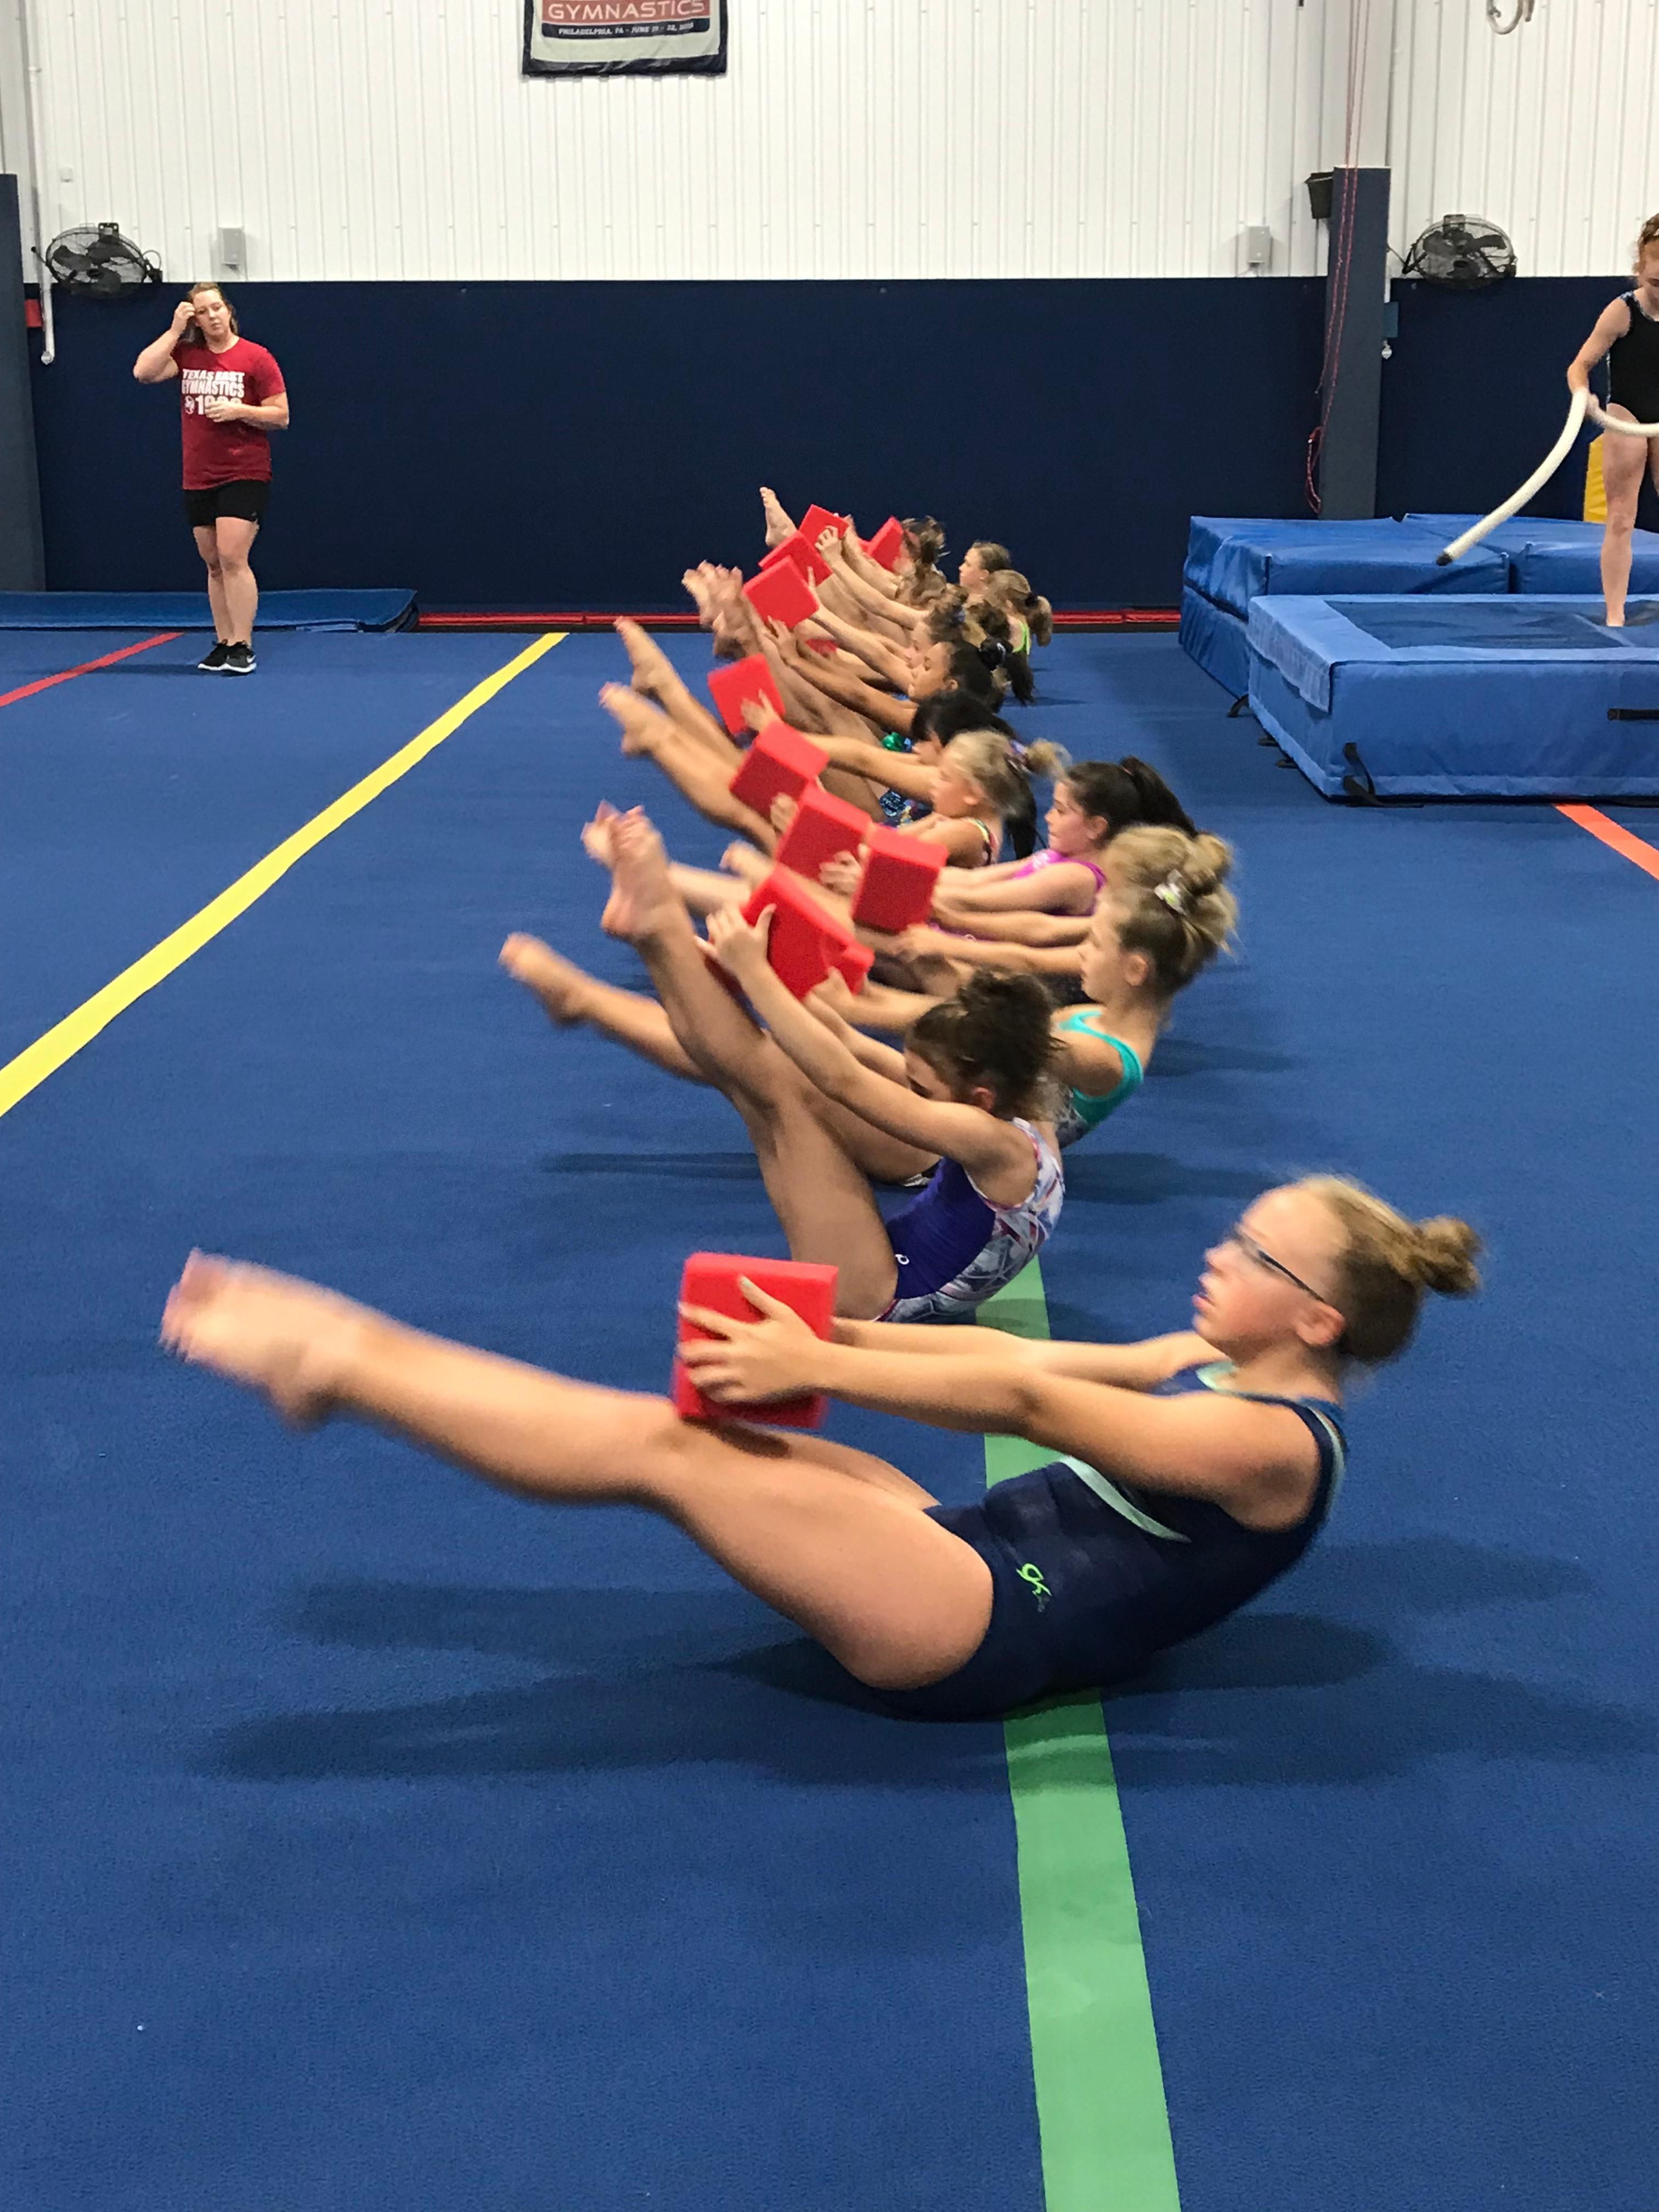 Texas East Gymnastics image 24